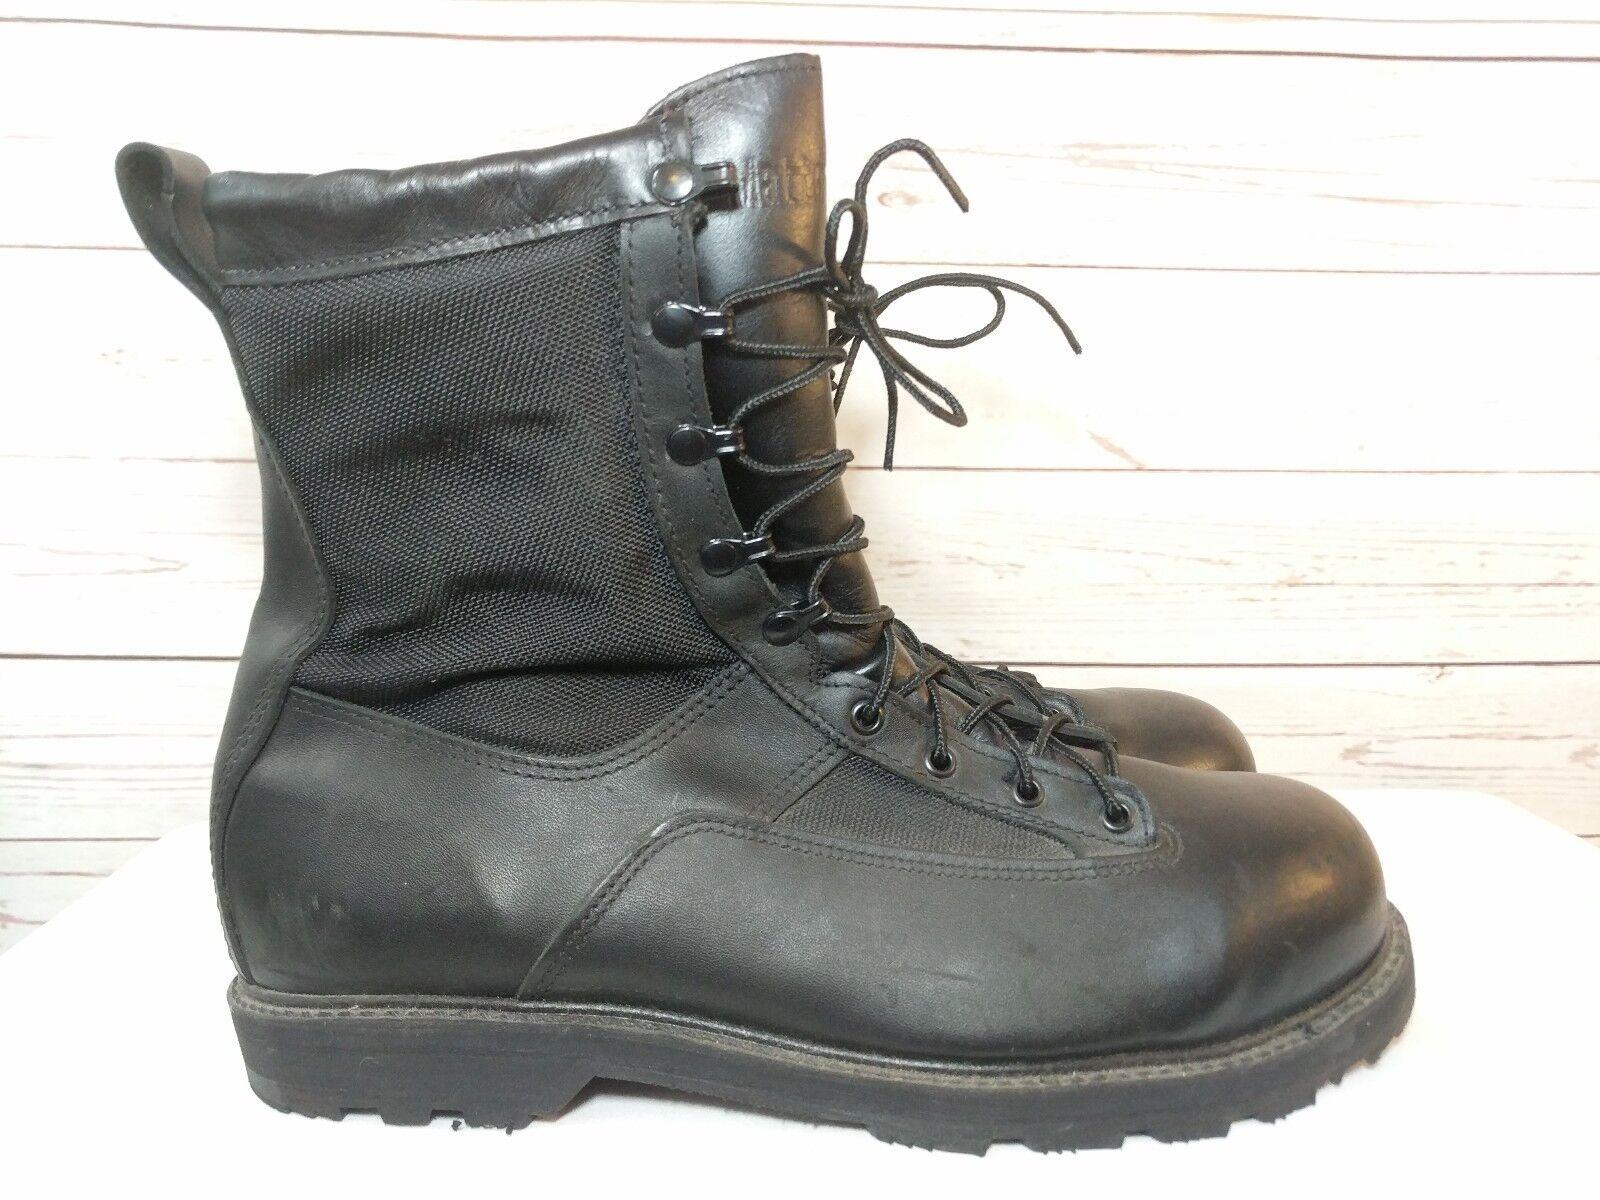 Cove Matterhorn Leather Gore-Tex Steel Toe Search & Rescue Boots Men's Sz 12.5W